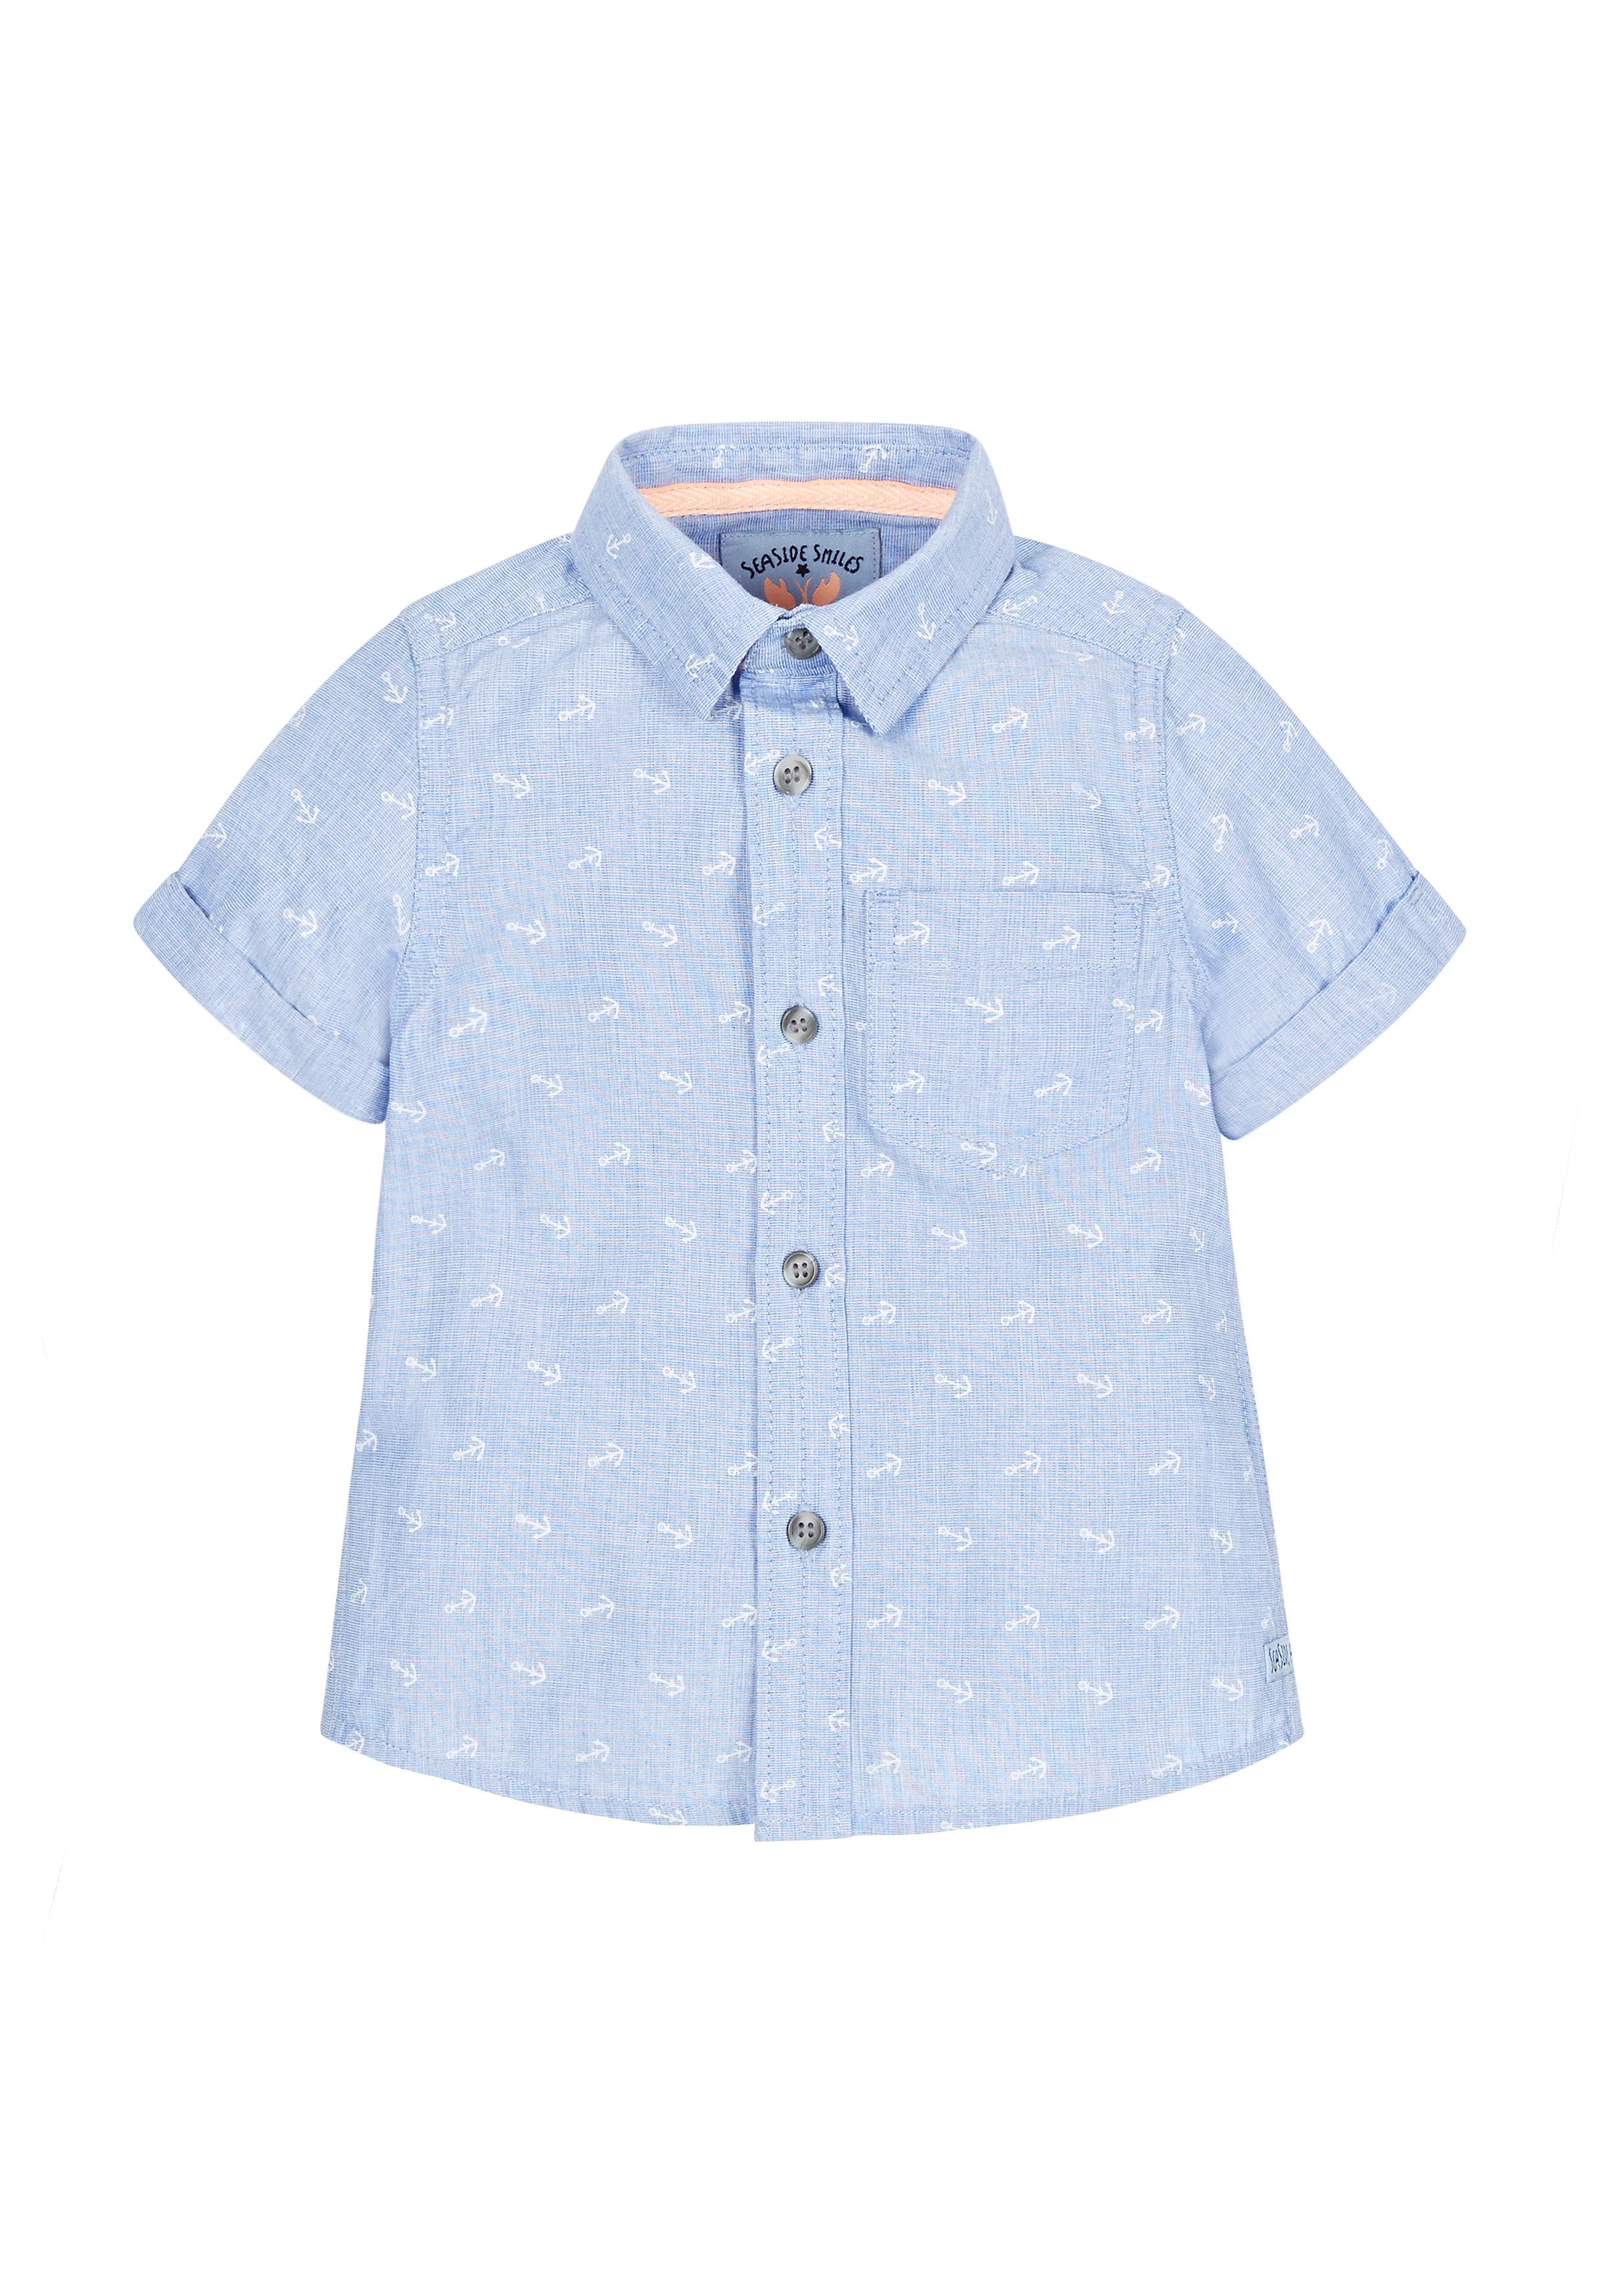 Mothercare | Boys Half Sleeves Anchor Print Shirt - Blue